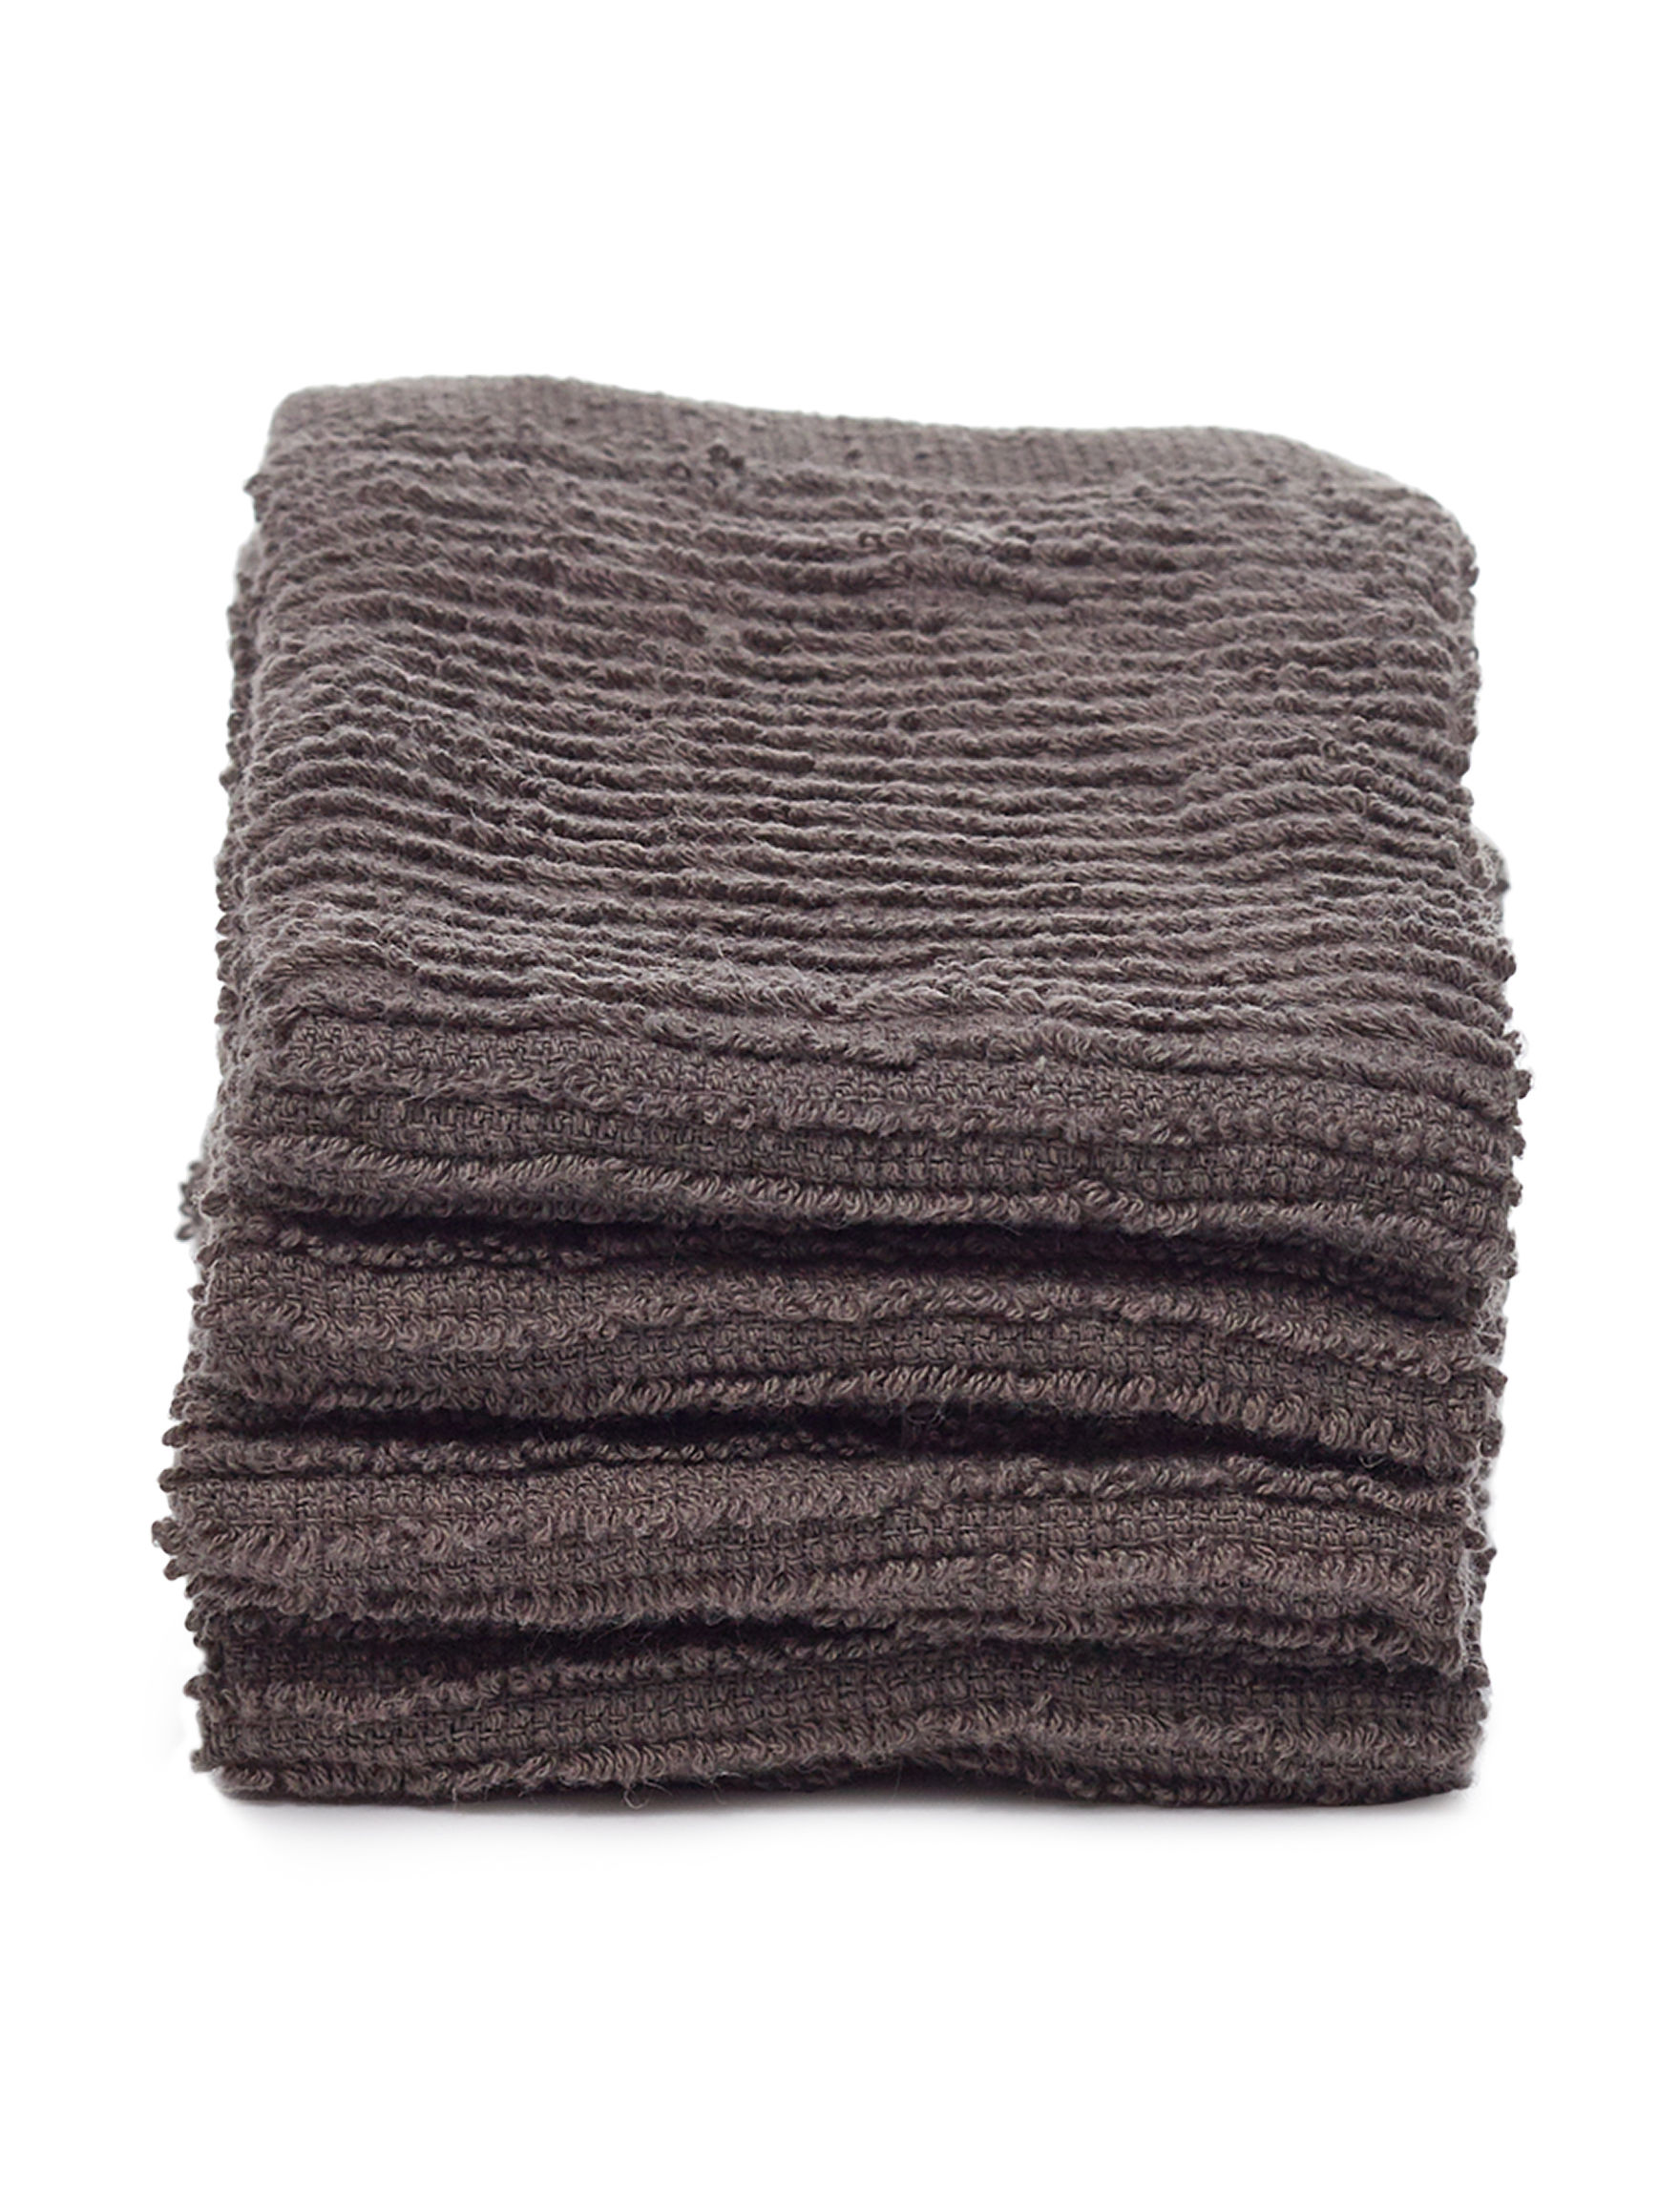 Pantry Grey Dish Towels Kitchen Linens